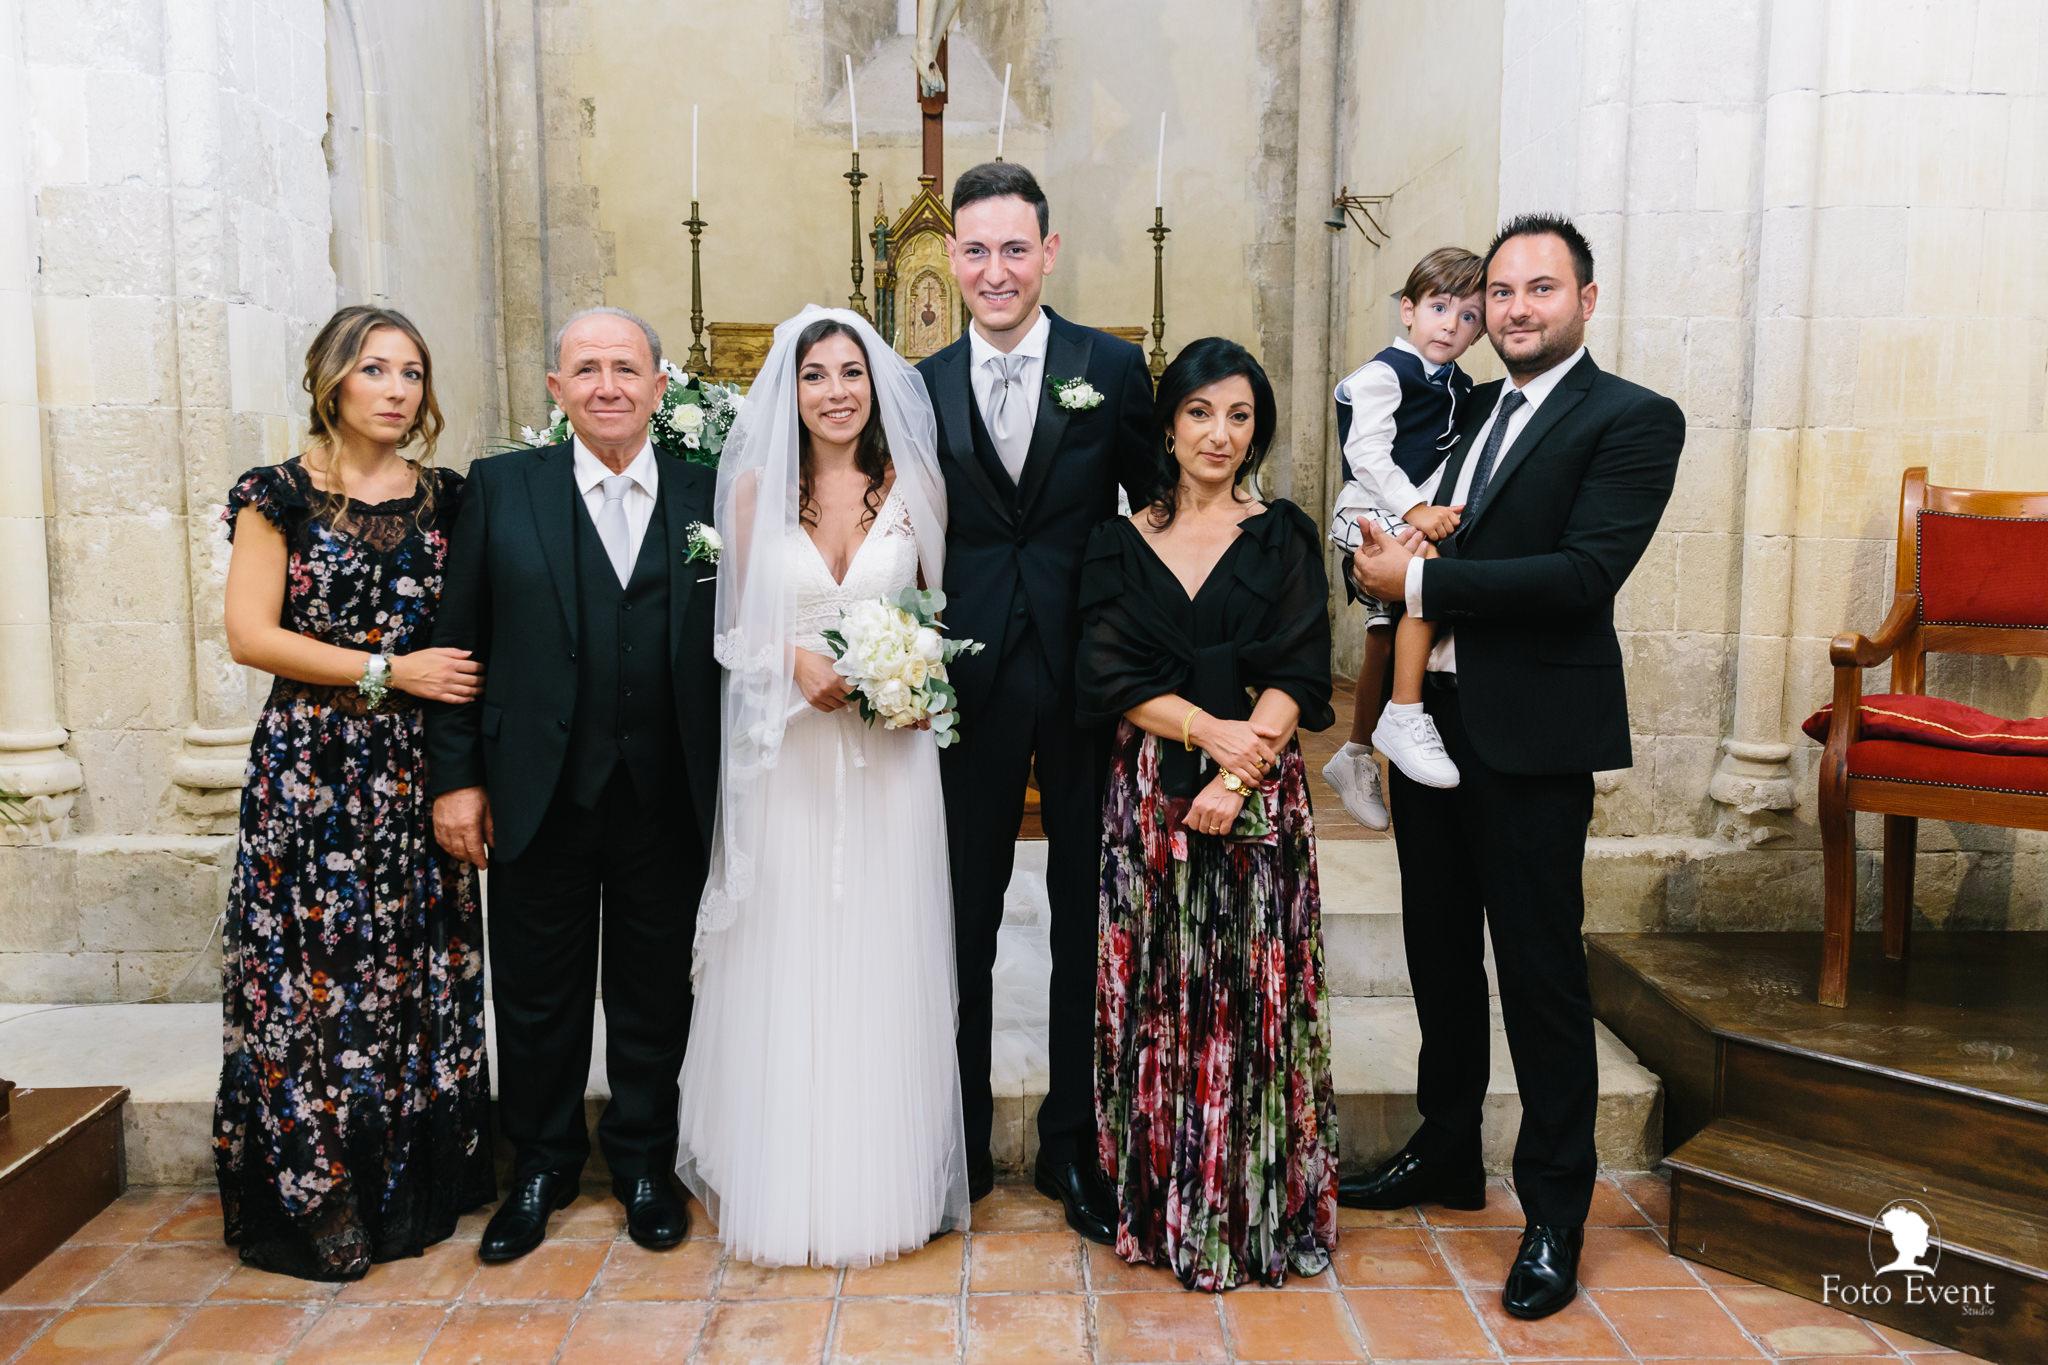 027-2019-08-23-Matrimonio-Lucia-e-Rosario-Scopelliti-5DE-1451